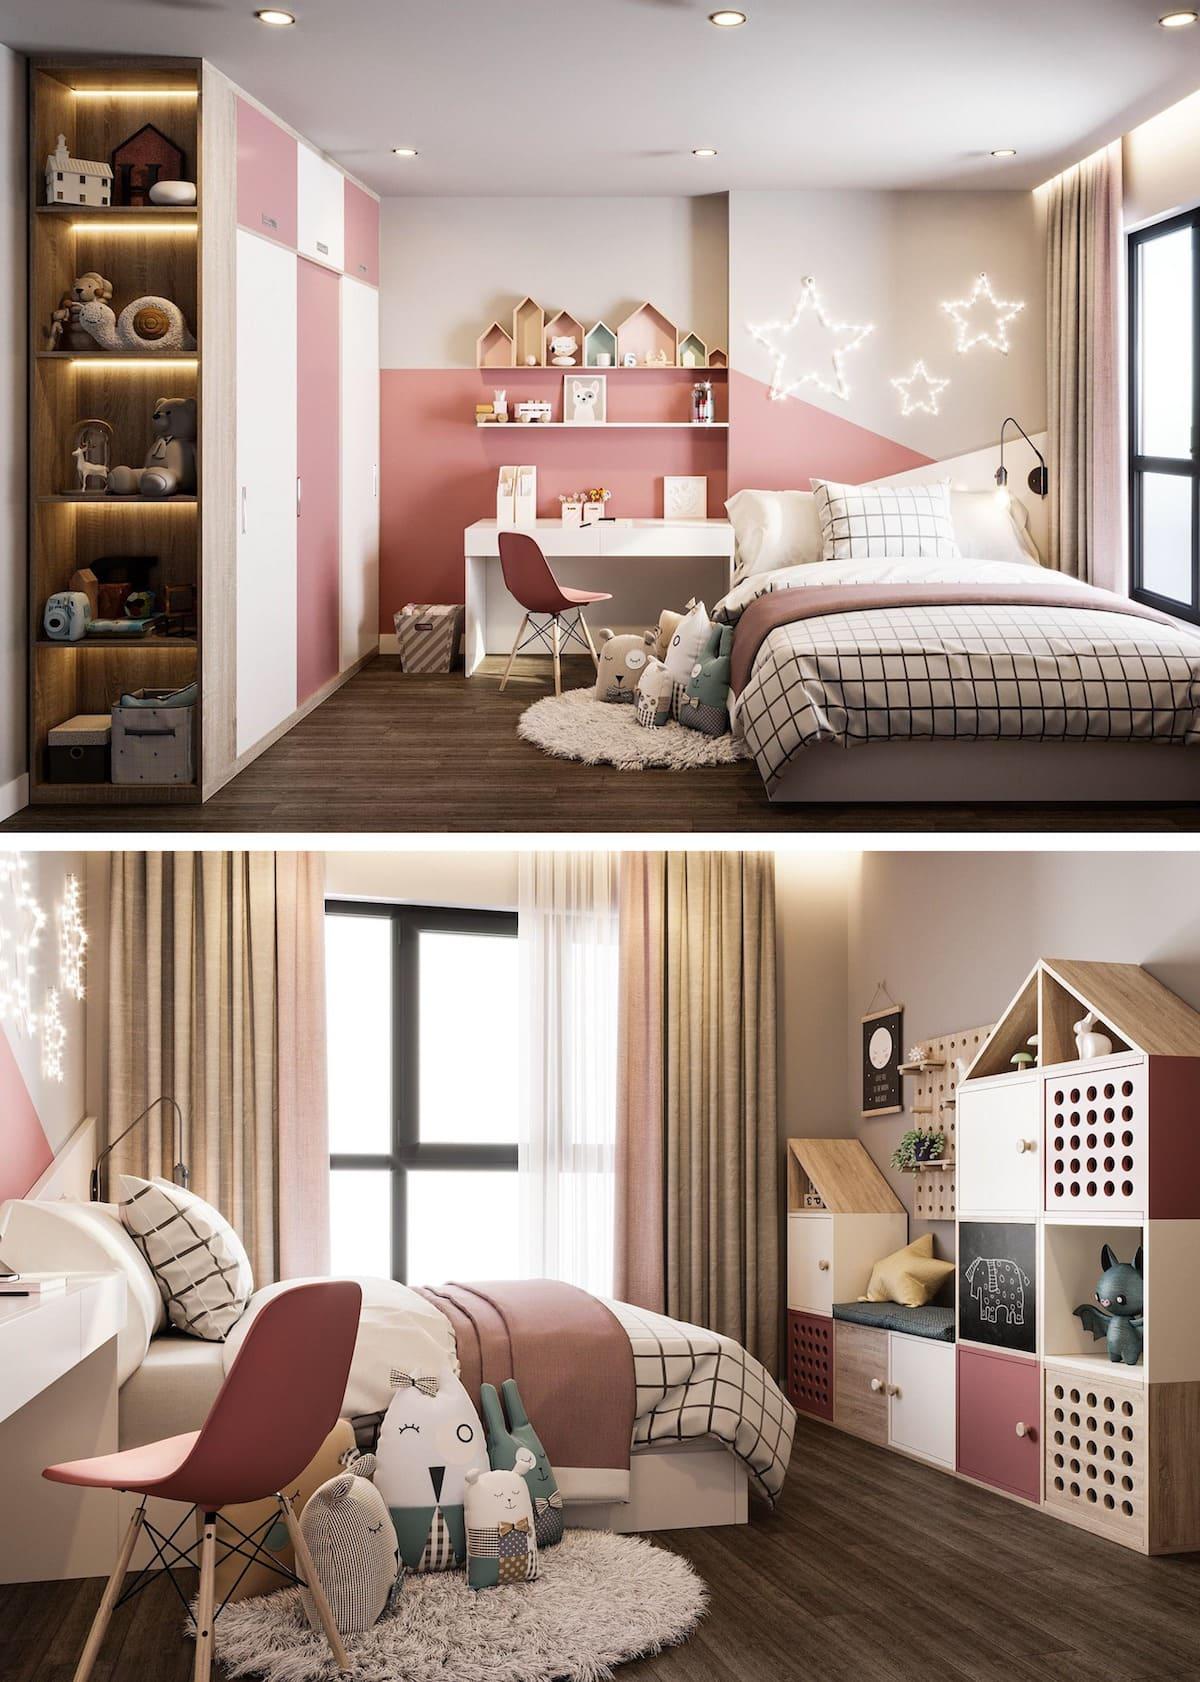 интерьер детской комнаты фото 19